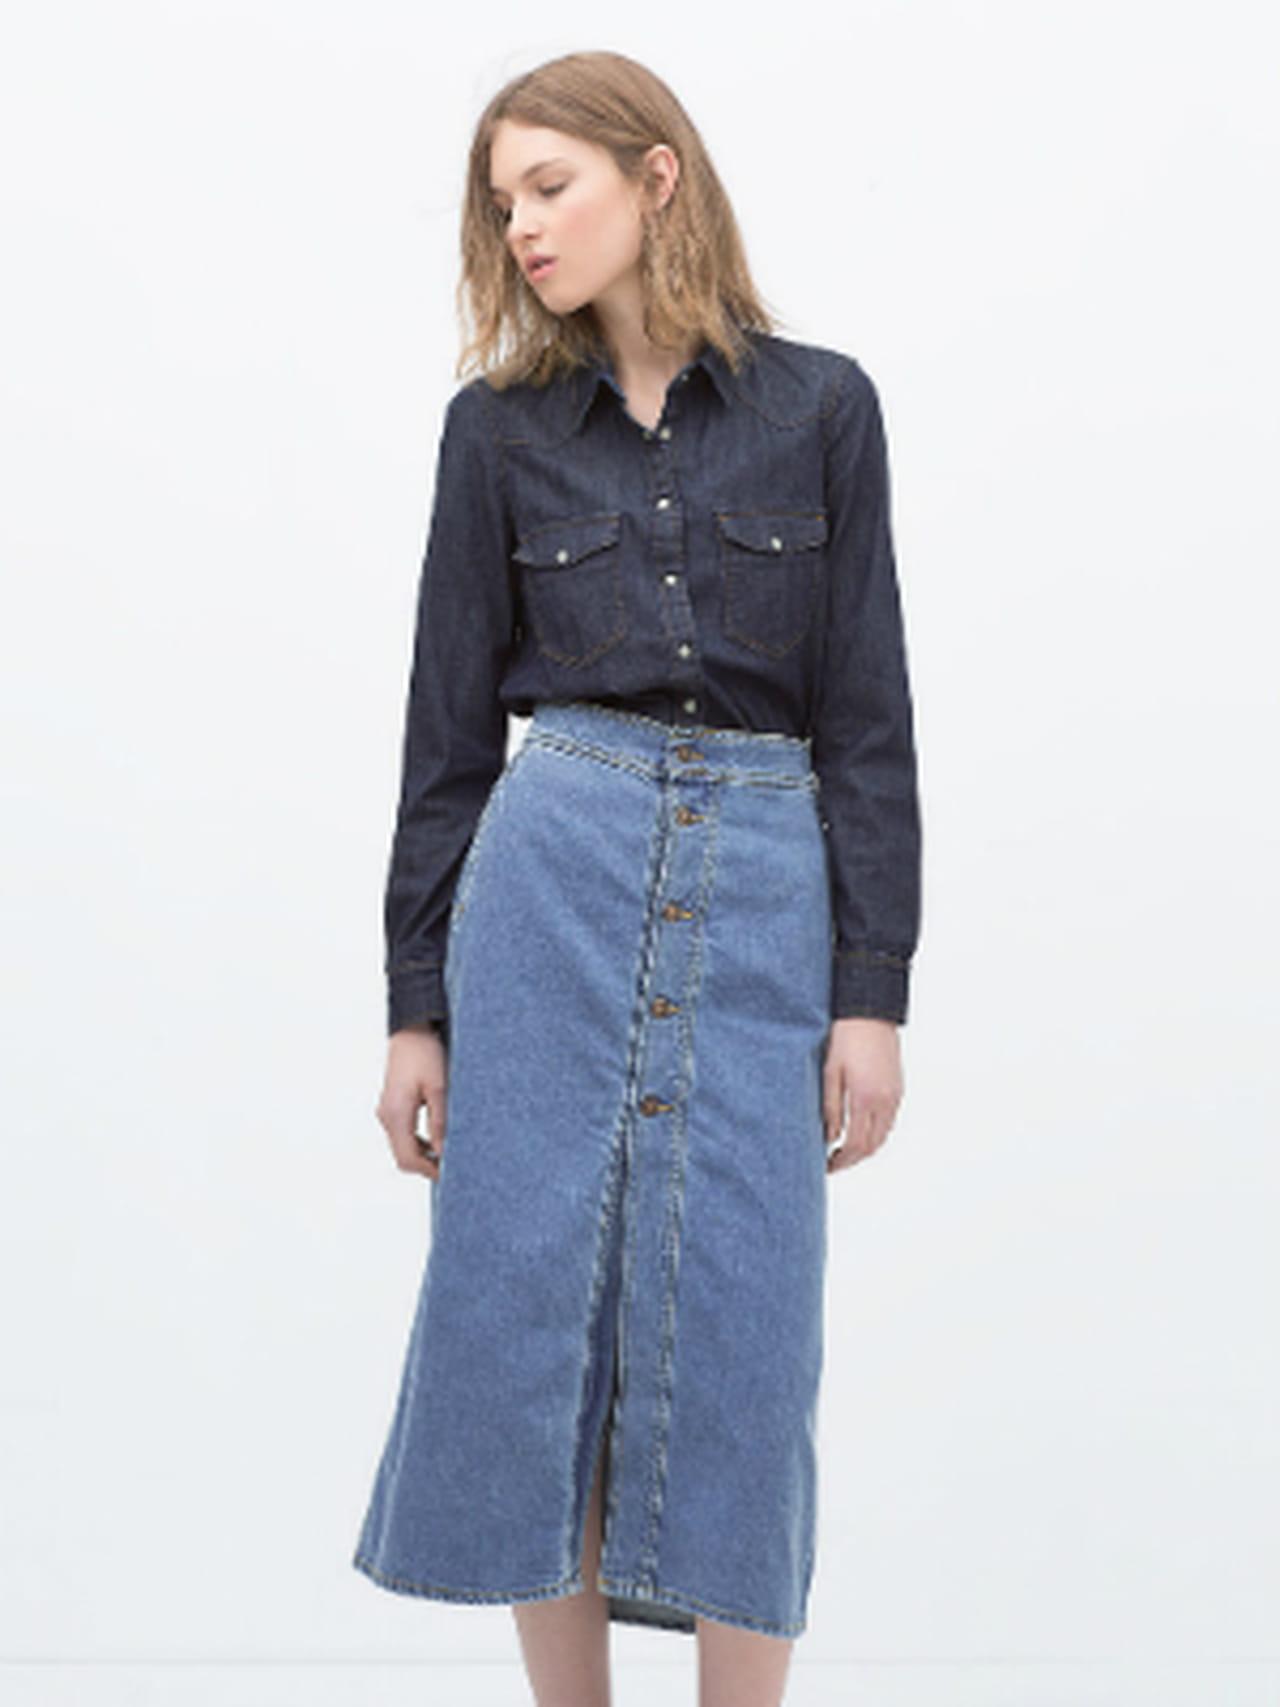 625ff4636e0fc8 Jupe longue boutons en jean bleu de Zara